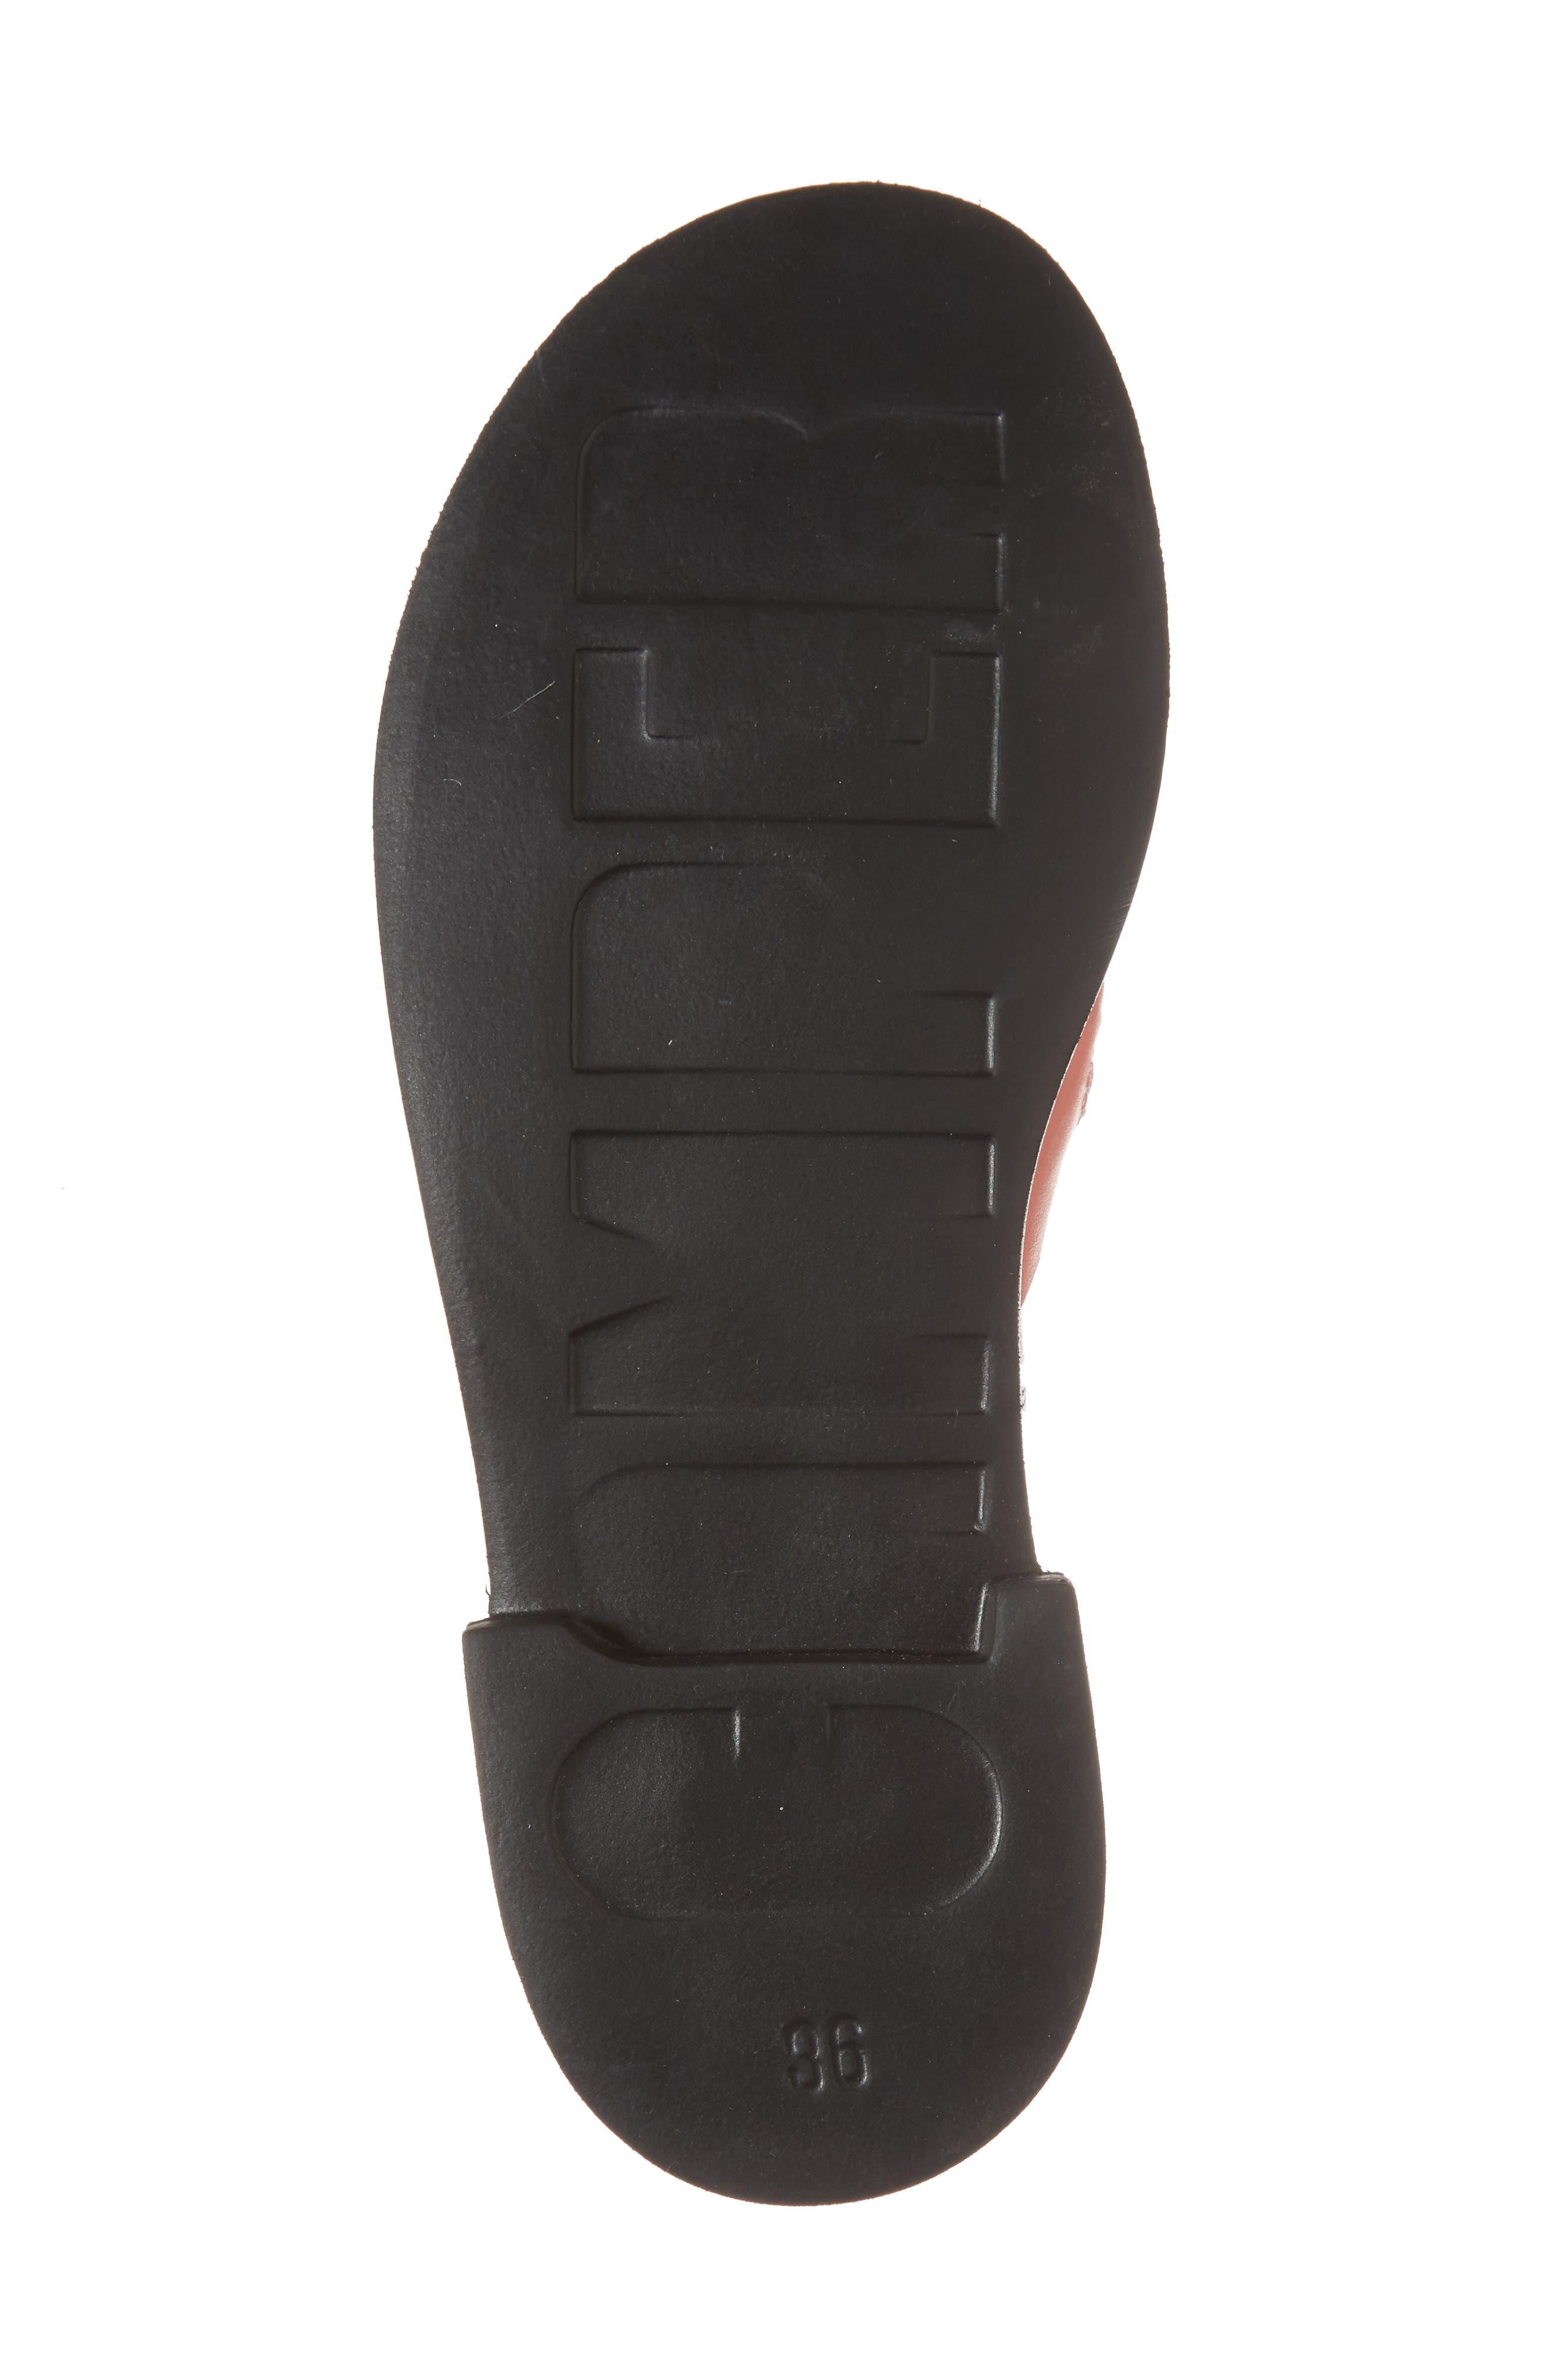 Twins Slingback Sandal,                             Alternate thumbnail 11, color,                             Multi - Assorted Leather